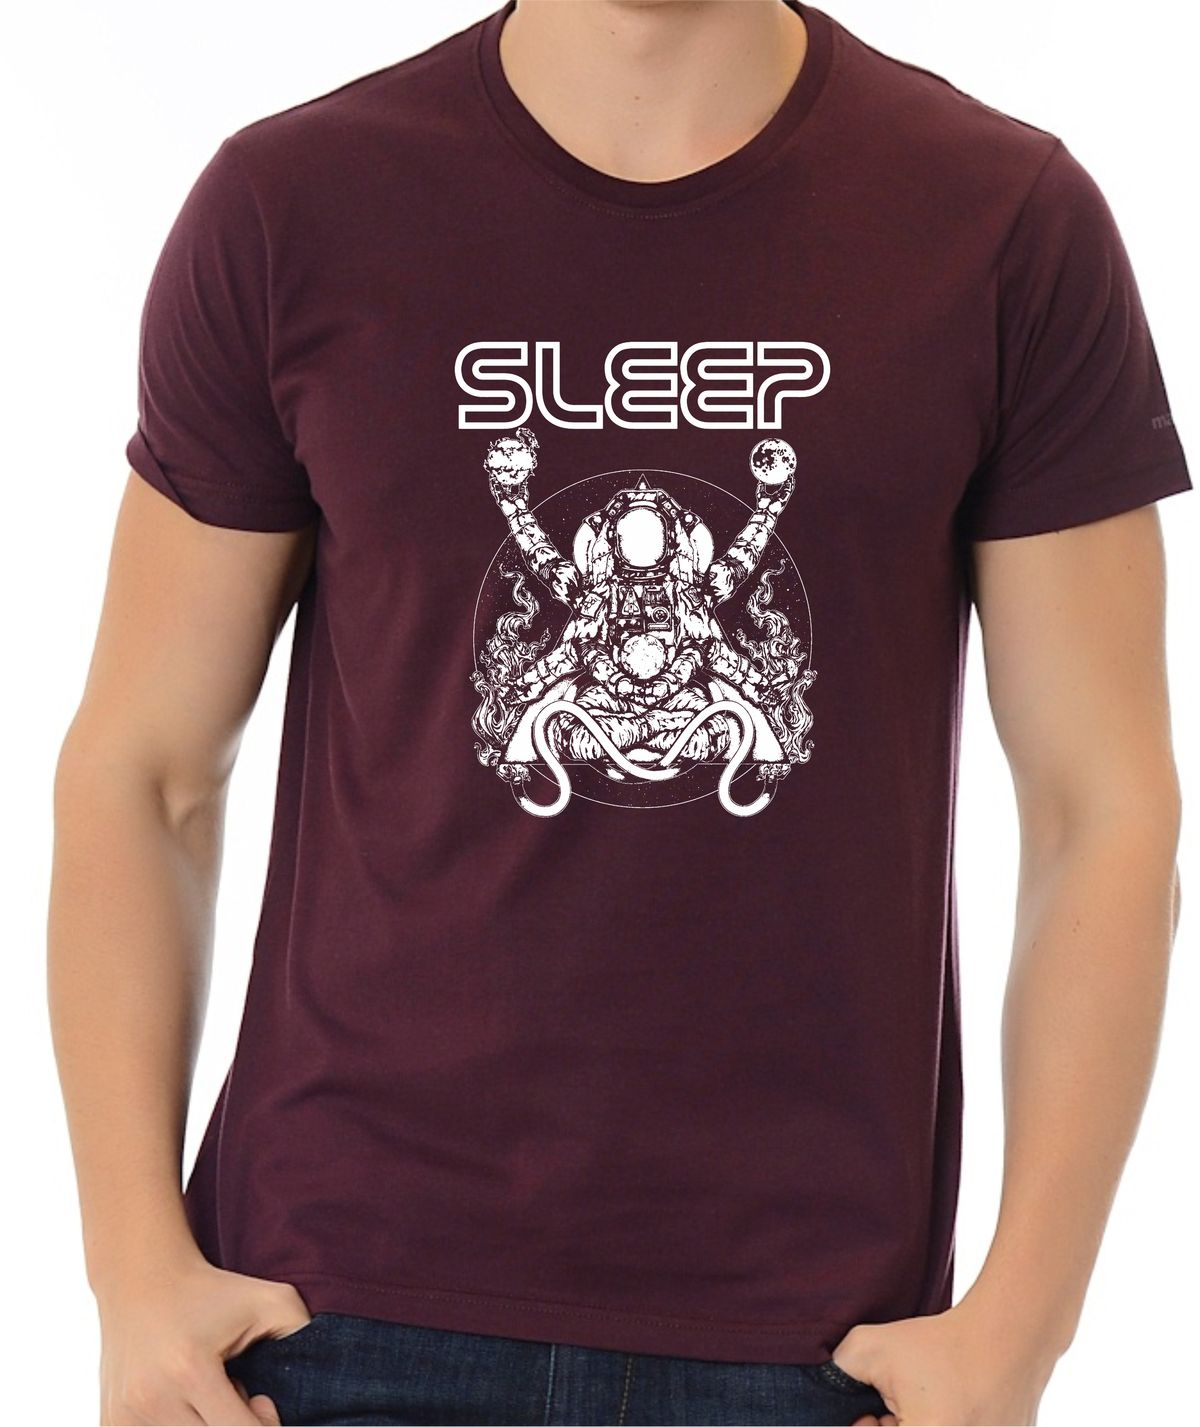 c8d5dab71 Sleep Shirts Band - Nils Stucki Kieferorthopäde